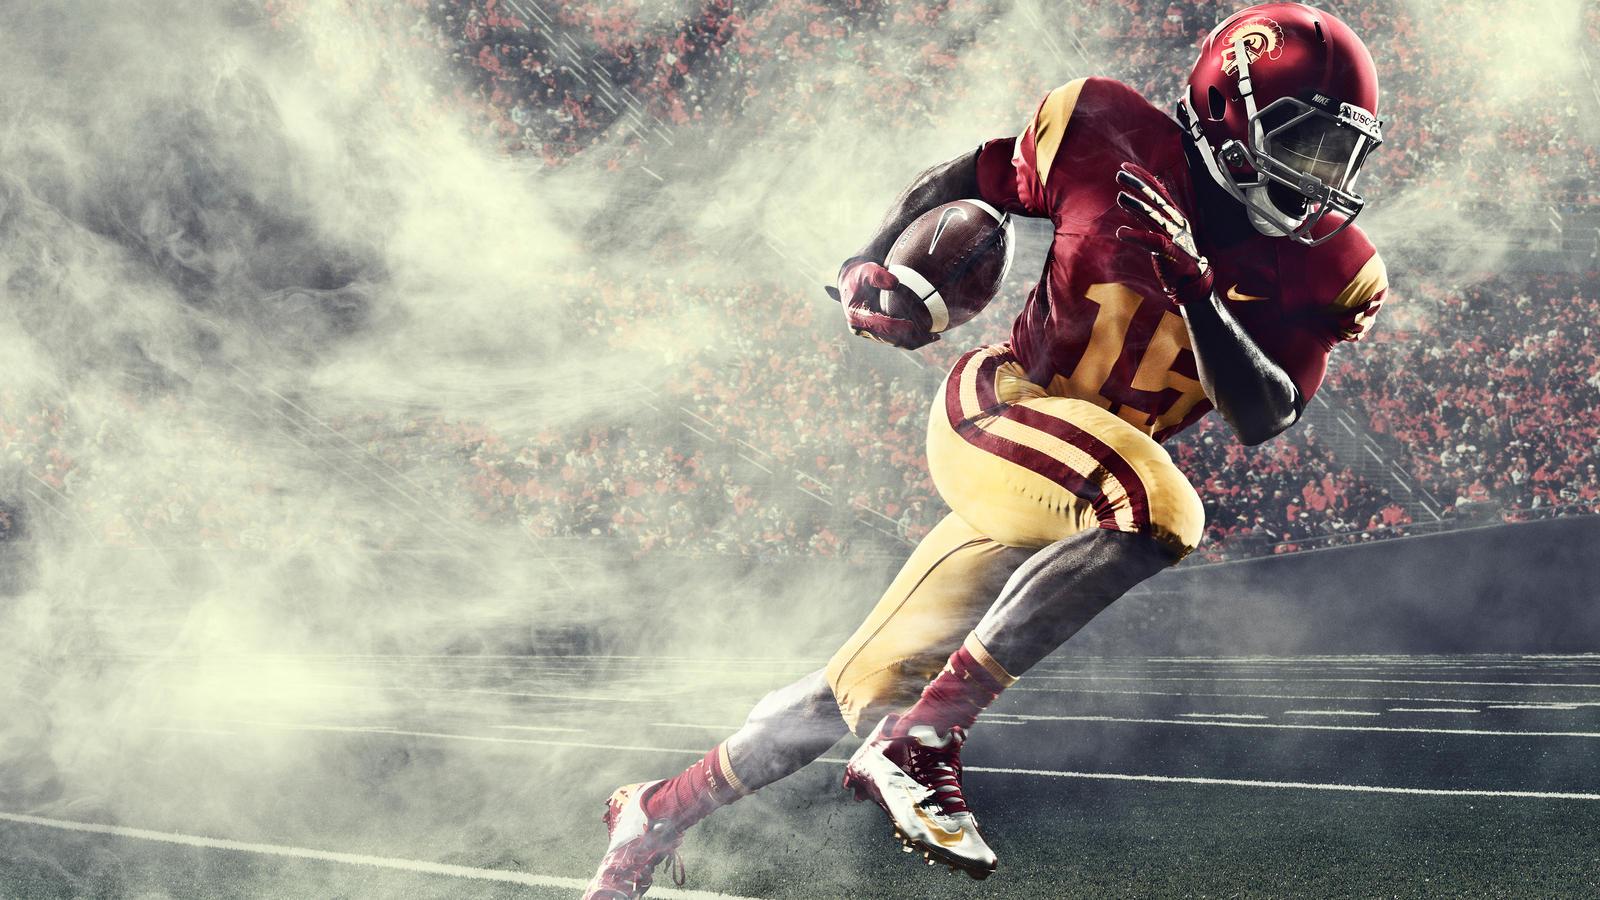 Florida State University Football >> Nike News - Seminoles, Trojans kick off college football season in new Nike cleats and gloves